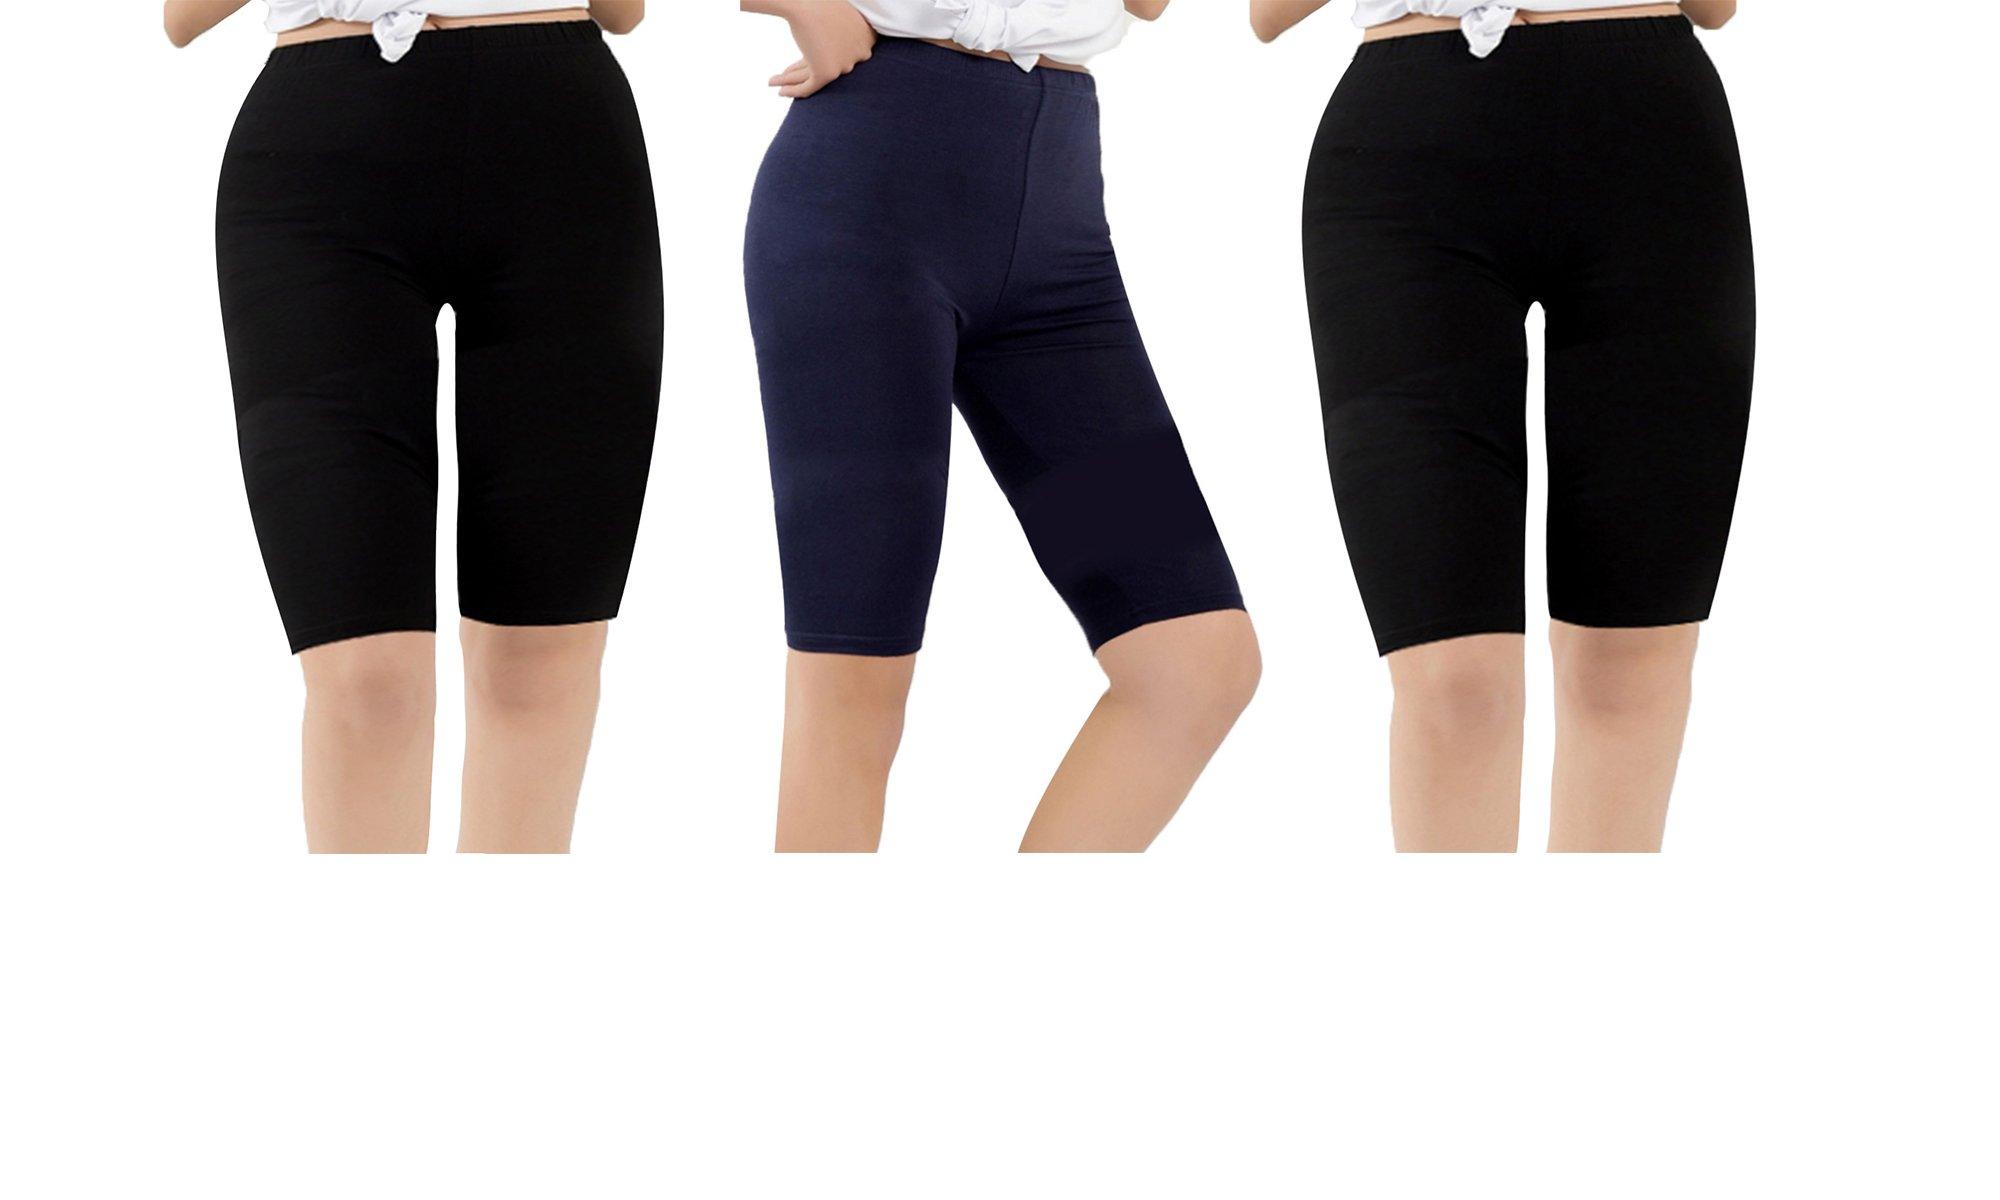 Zando Summer Casual Over The Knee Length Breathable Plus Size Comfort Modal Pants Capris Leggings for Women F Black Black Navy US XL-US 1X Plus